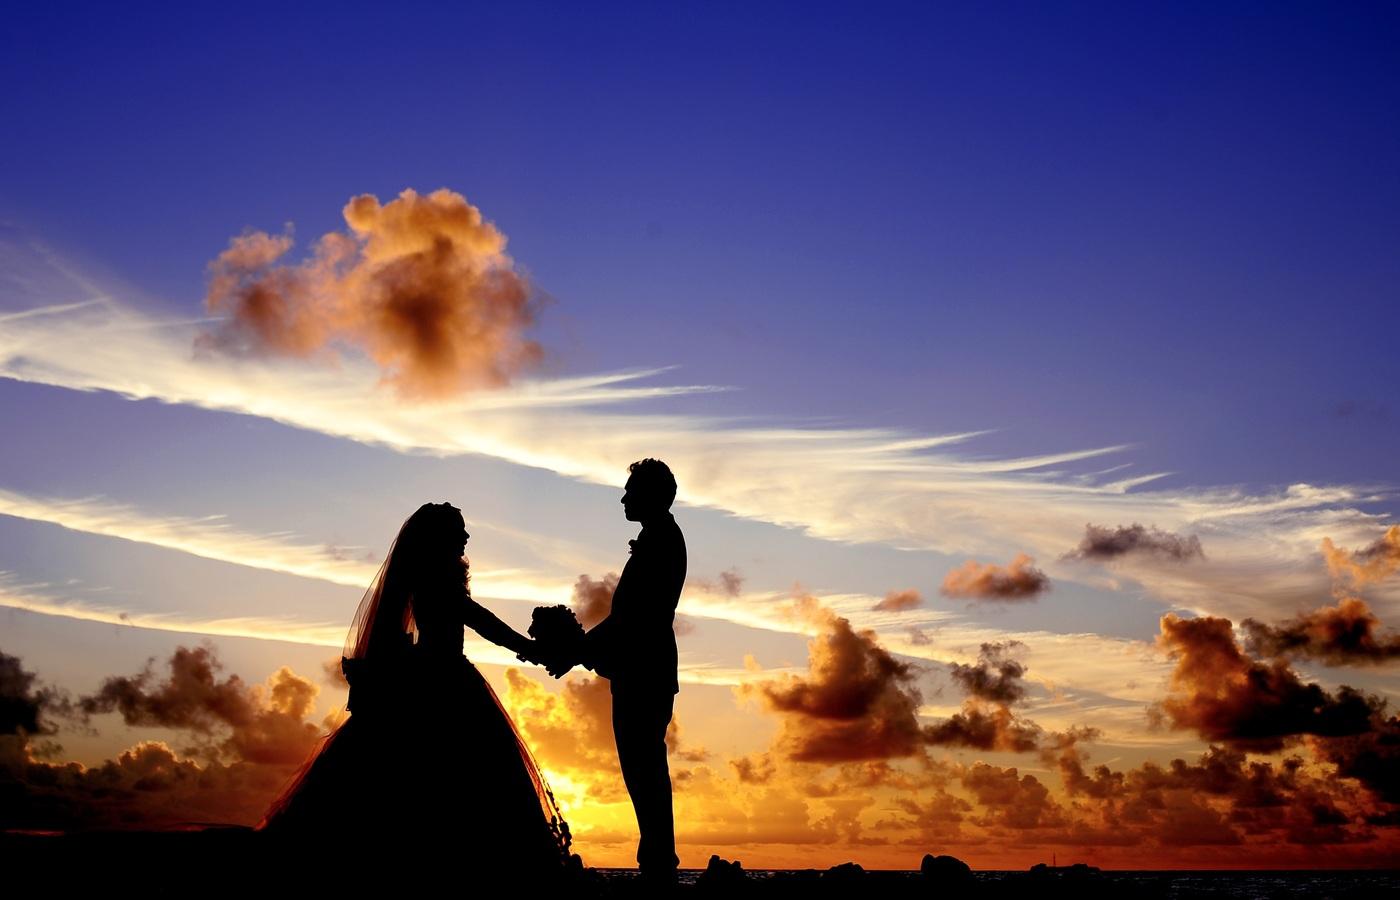 maldives-sunset-married-couple-w0.jpg